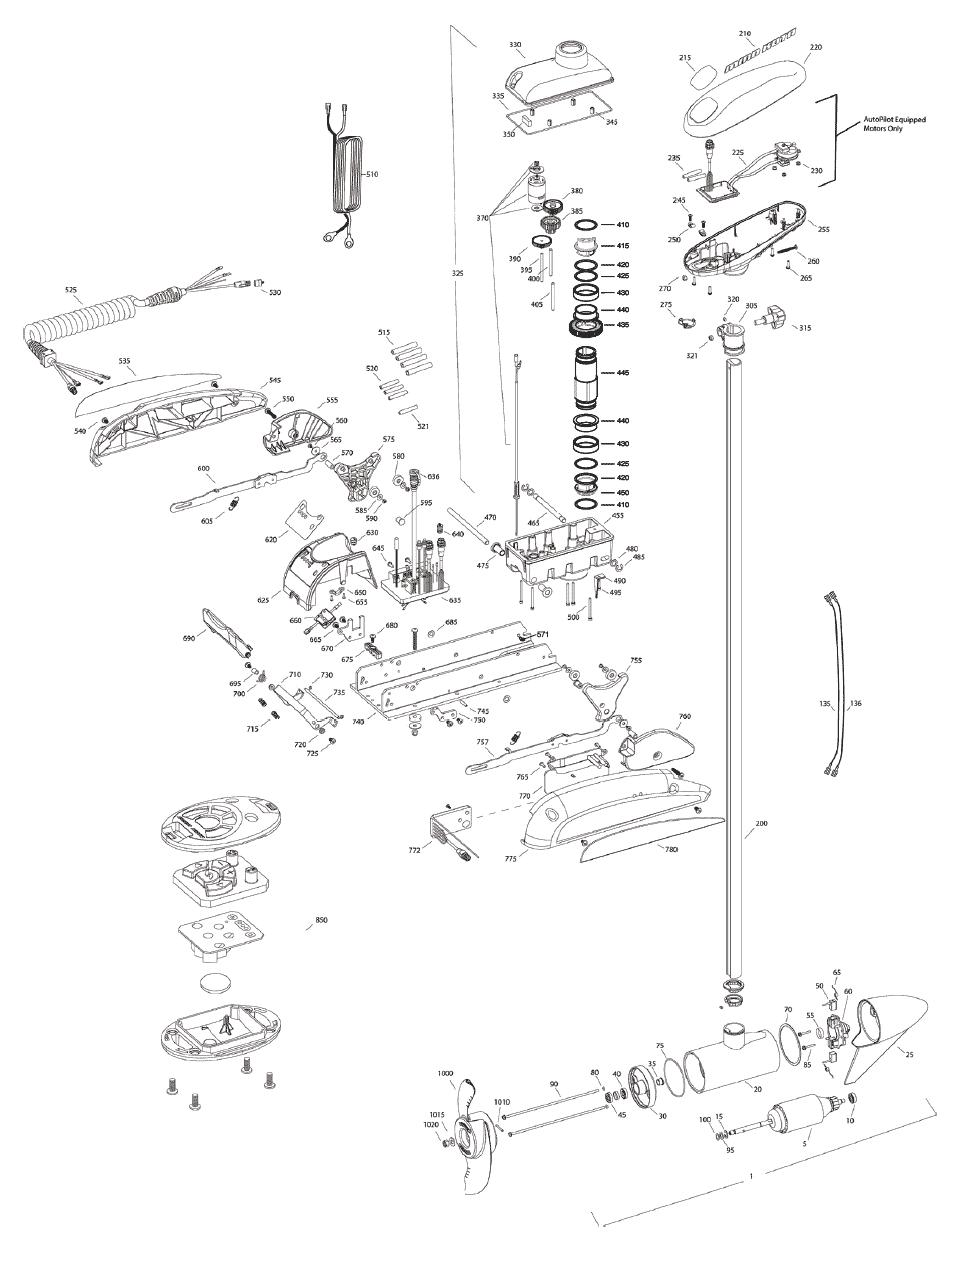 Generous minn kota 12v wiring schematic pictures inspiration rh thetada 1261